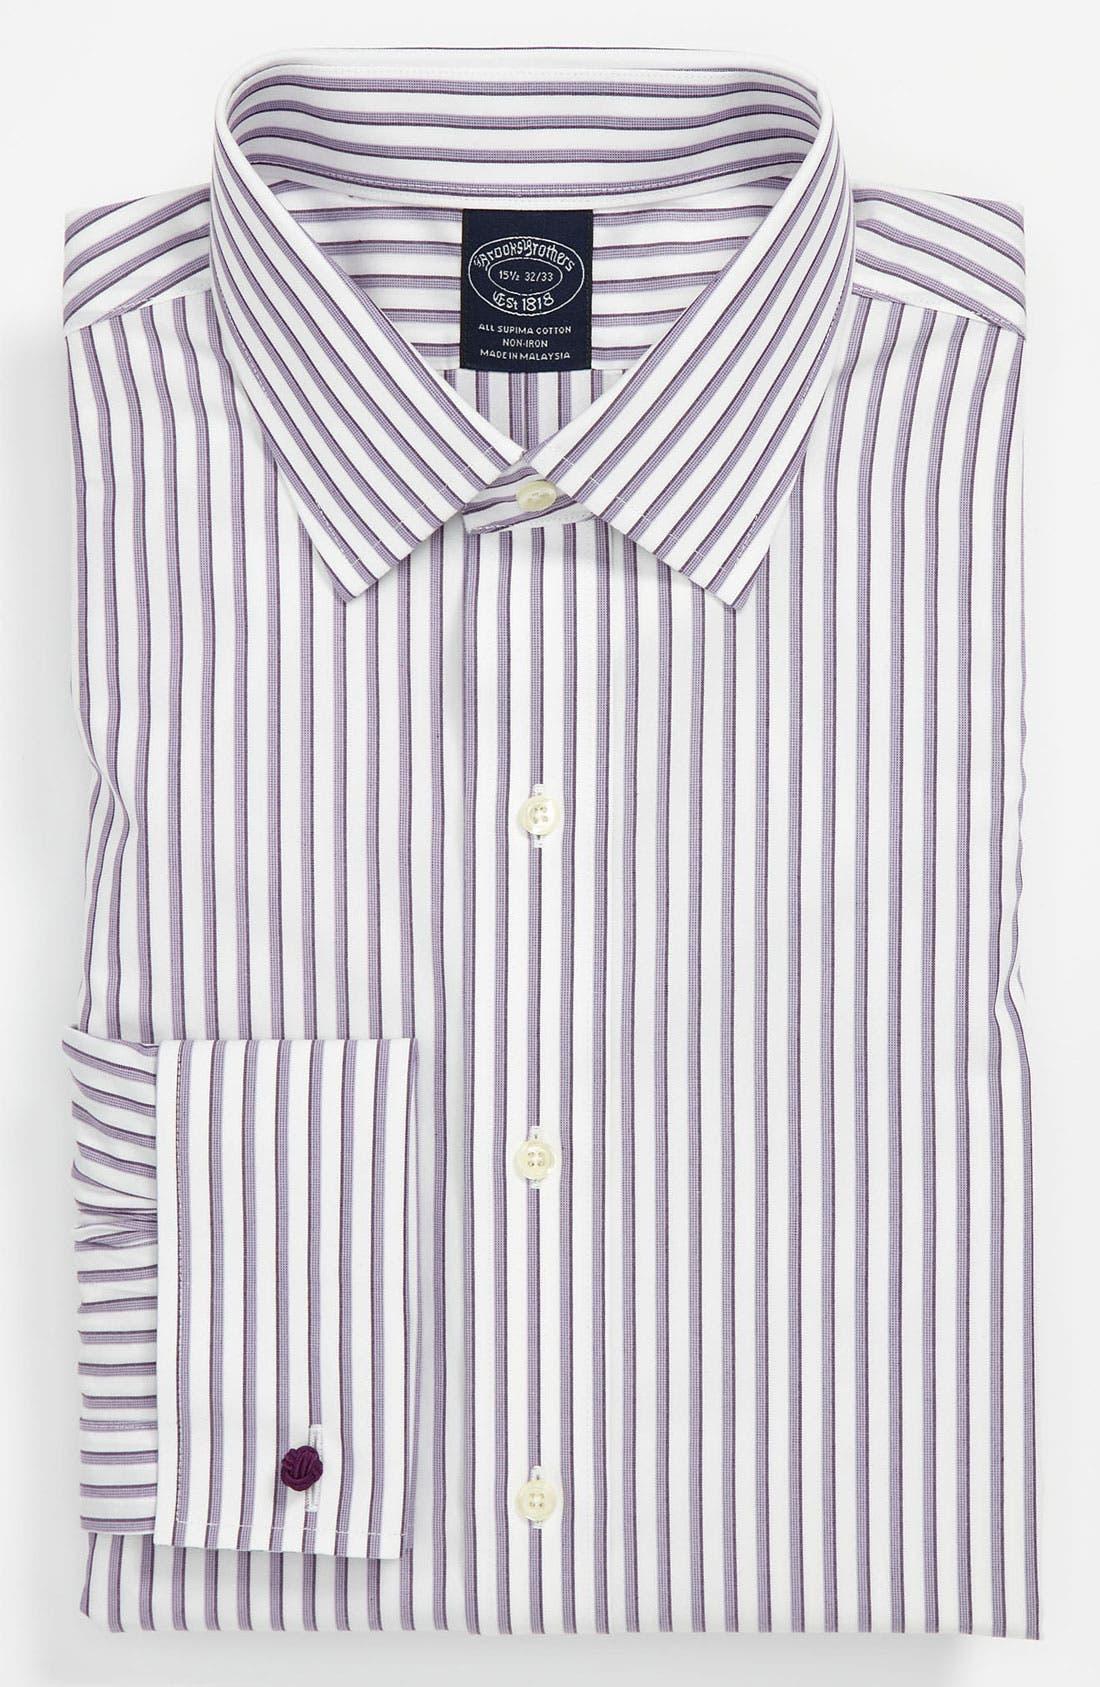 Alternate Image 1 Selected - Brooks Brothers Regular Fit Non-Iron Dress Shirt